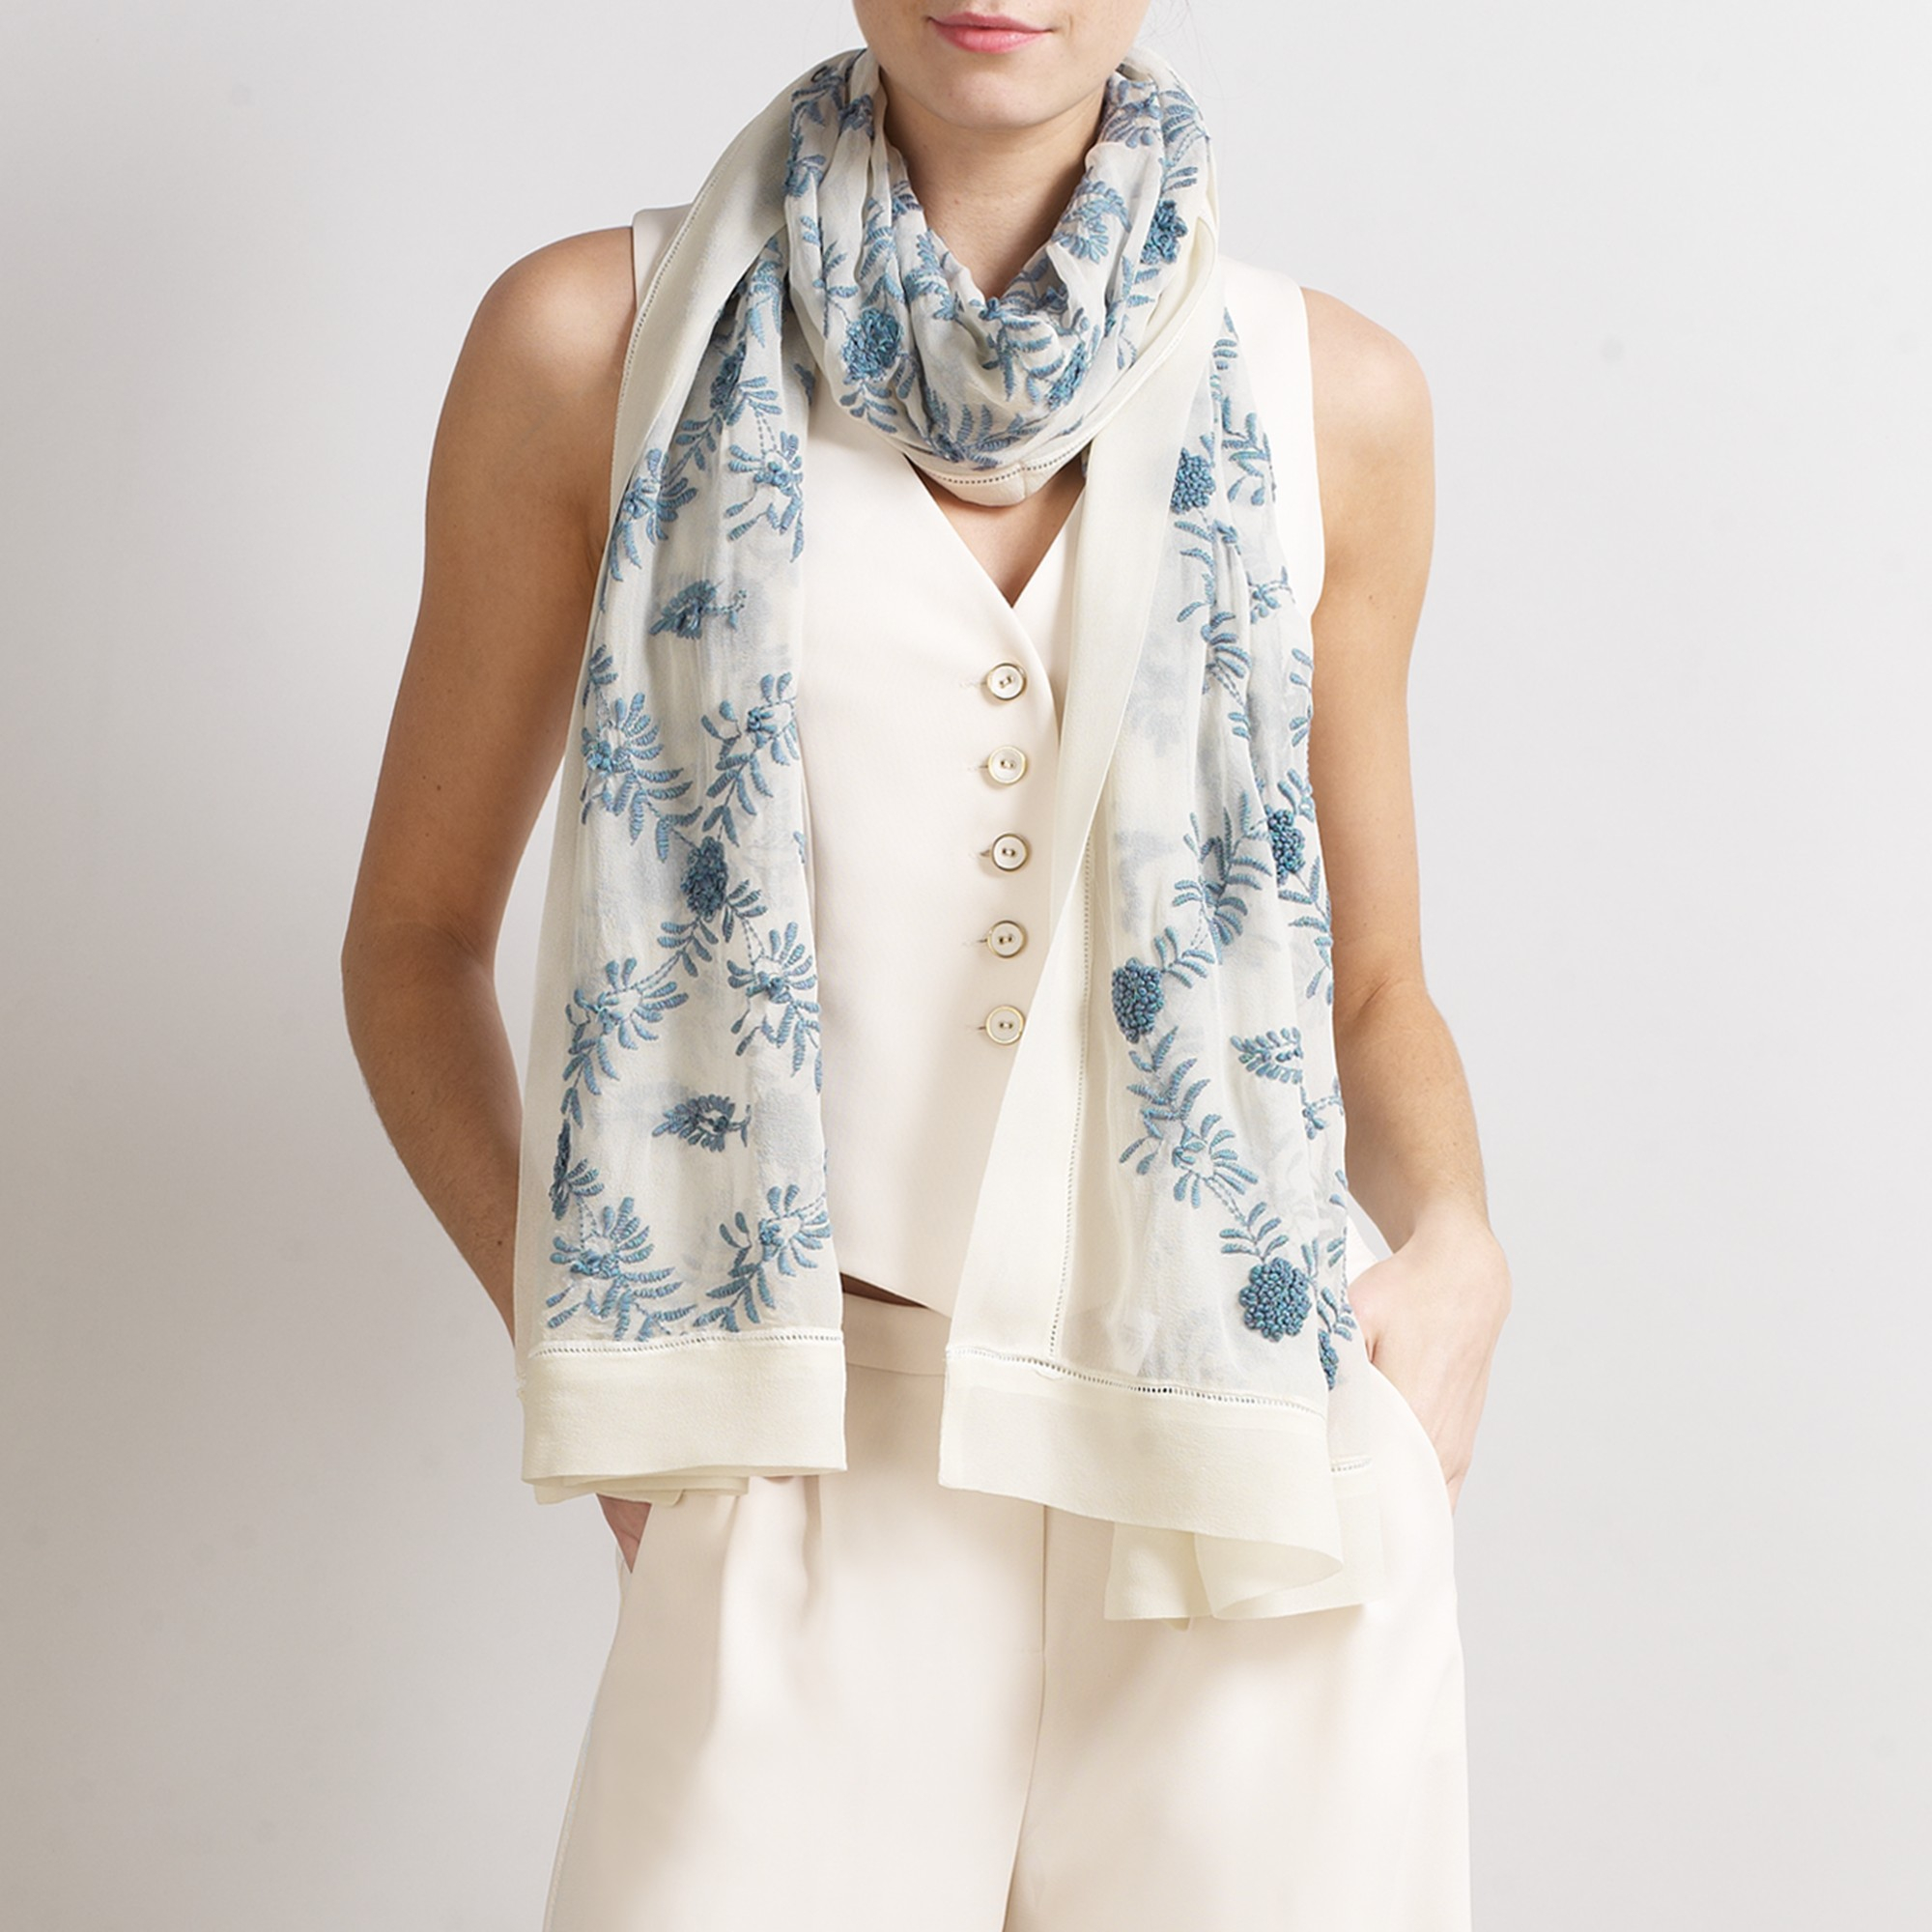 view faro camo in ferrari franco tattoo lyst accessories blue fullscreen scarf